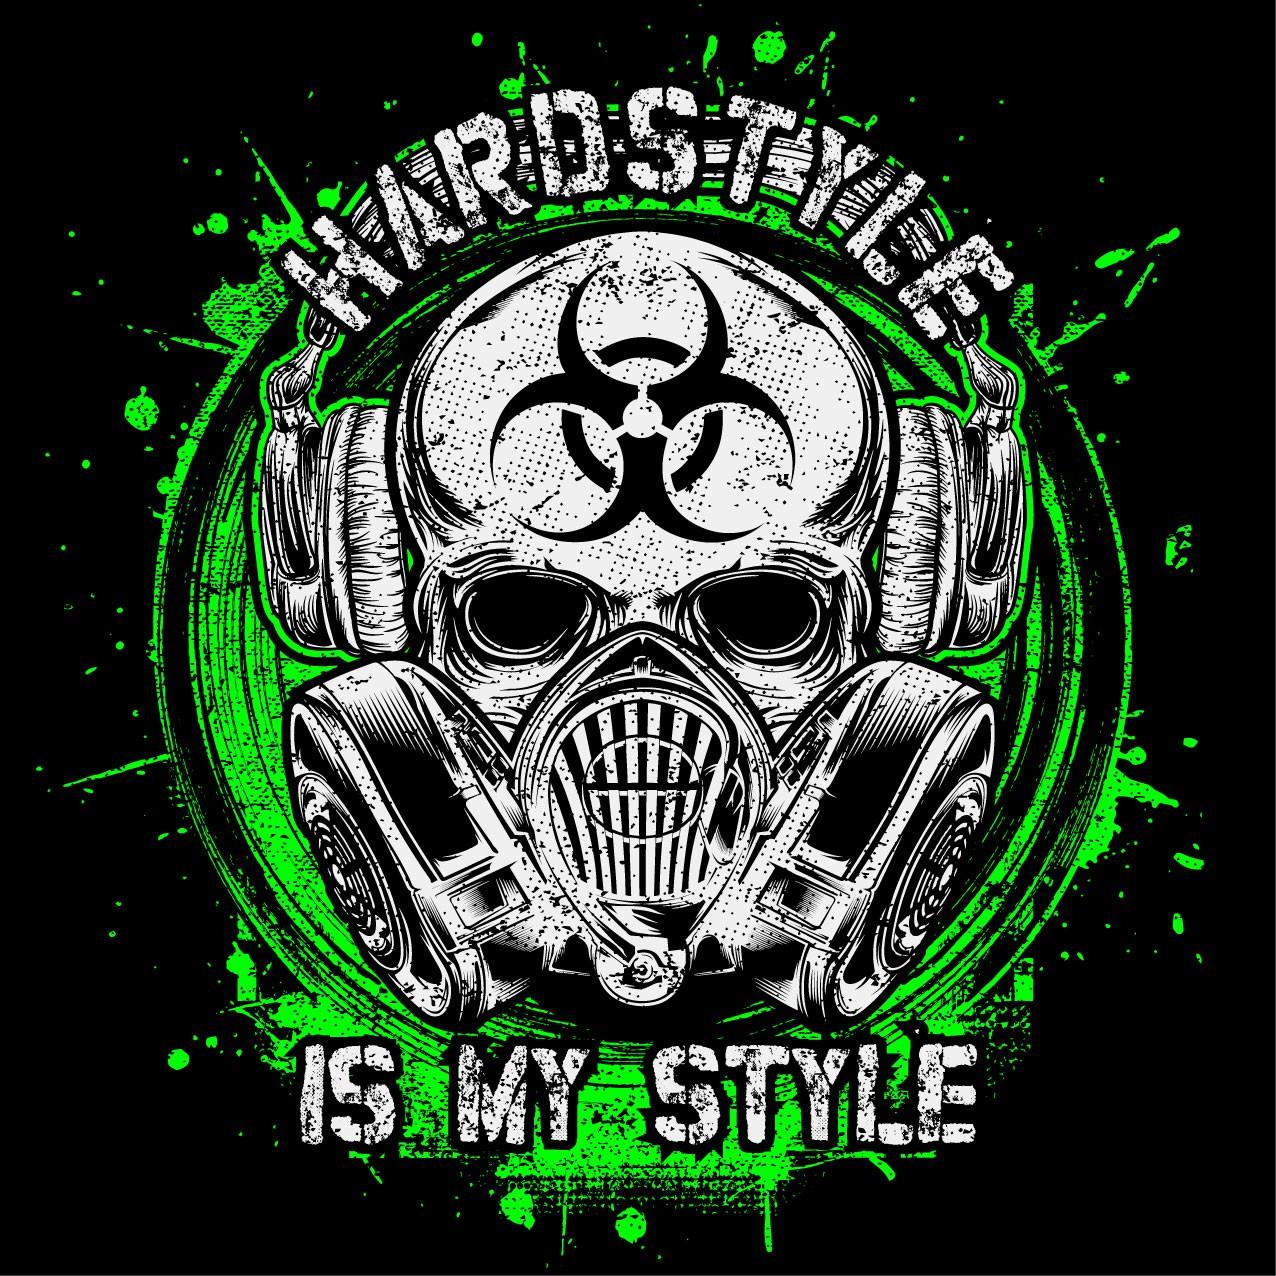 Hardstyle is my style T-Shirt Motiv